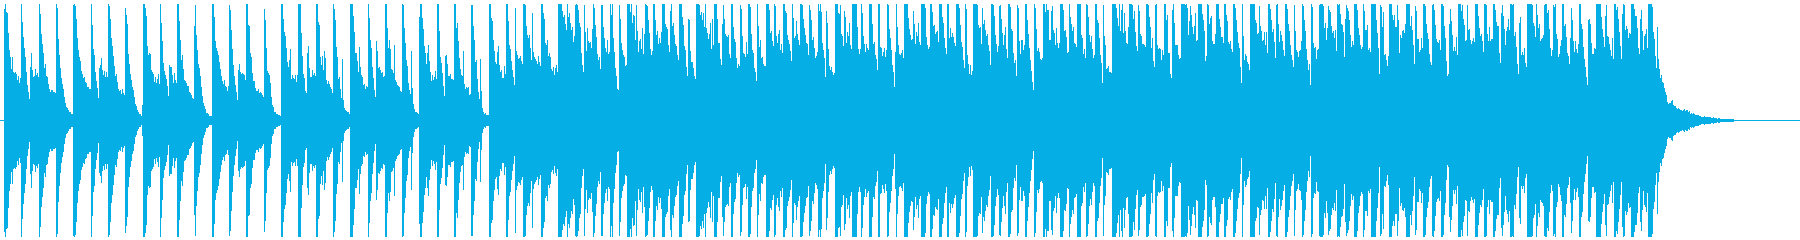 PopなBGMの再生済みの波形